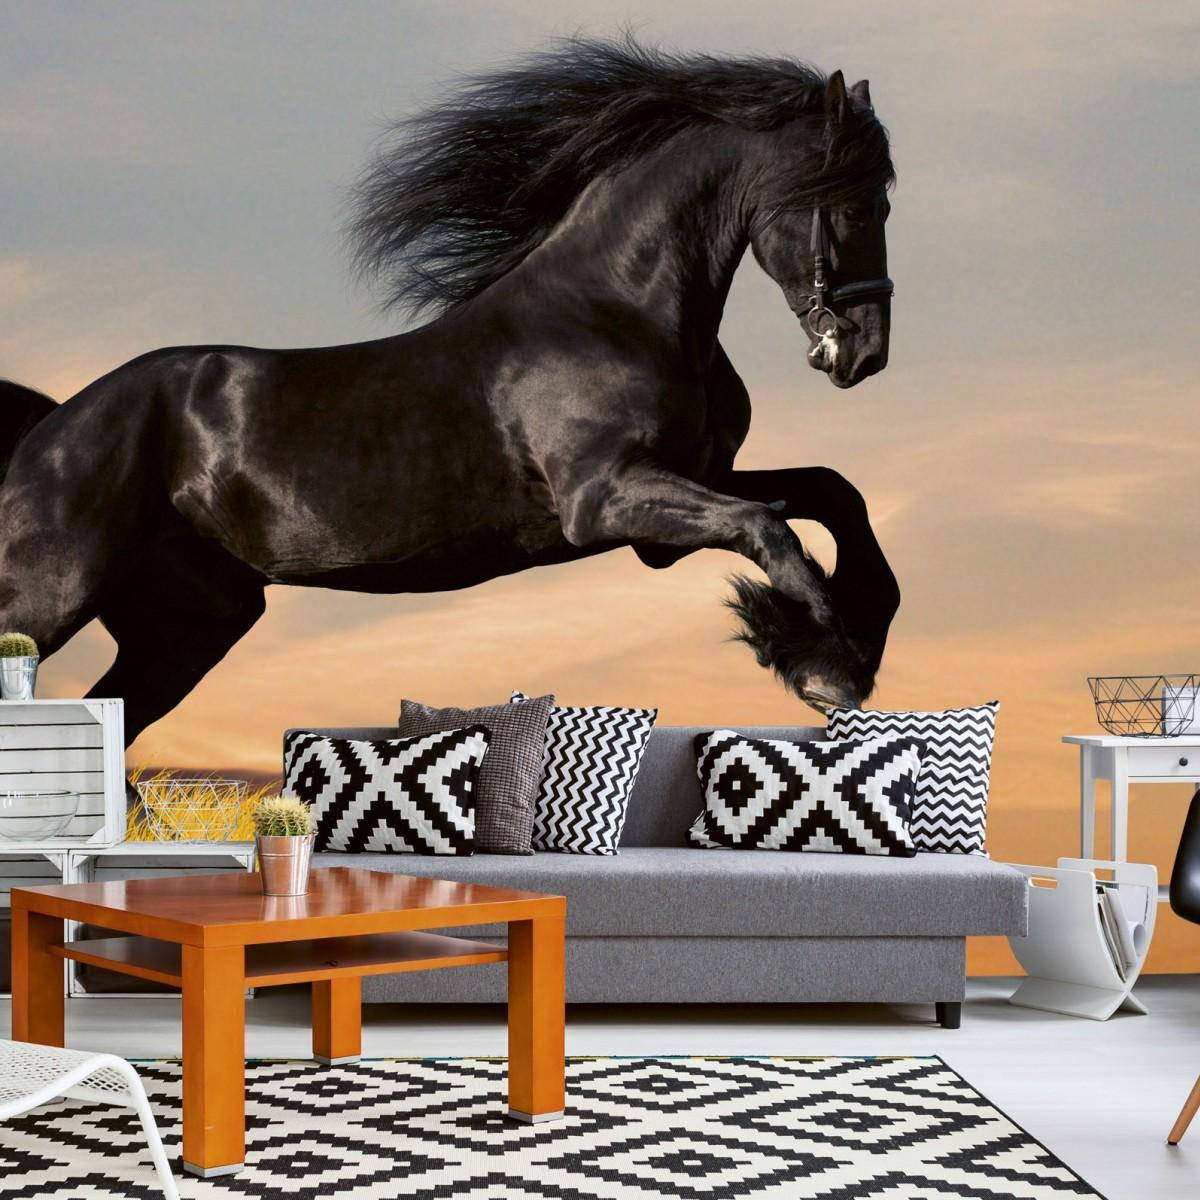 Foto tapet 3D Horse, Dimex, 5 fâșii, 375 x 250cm